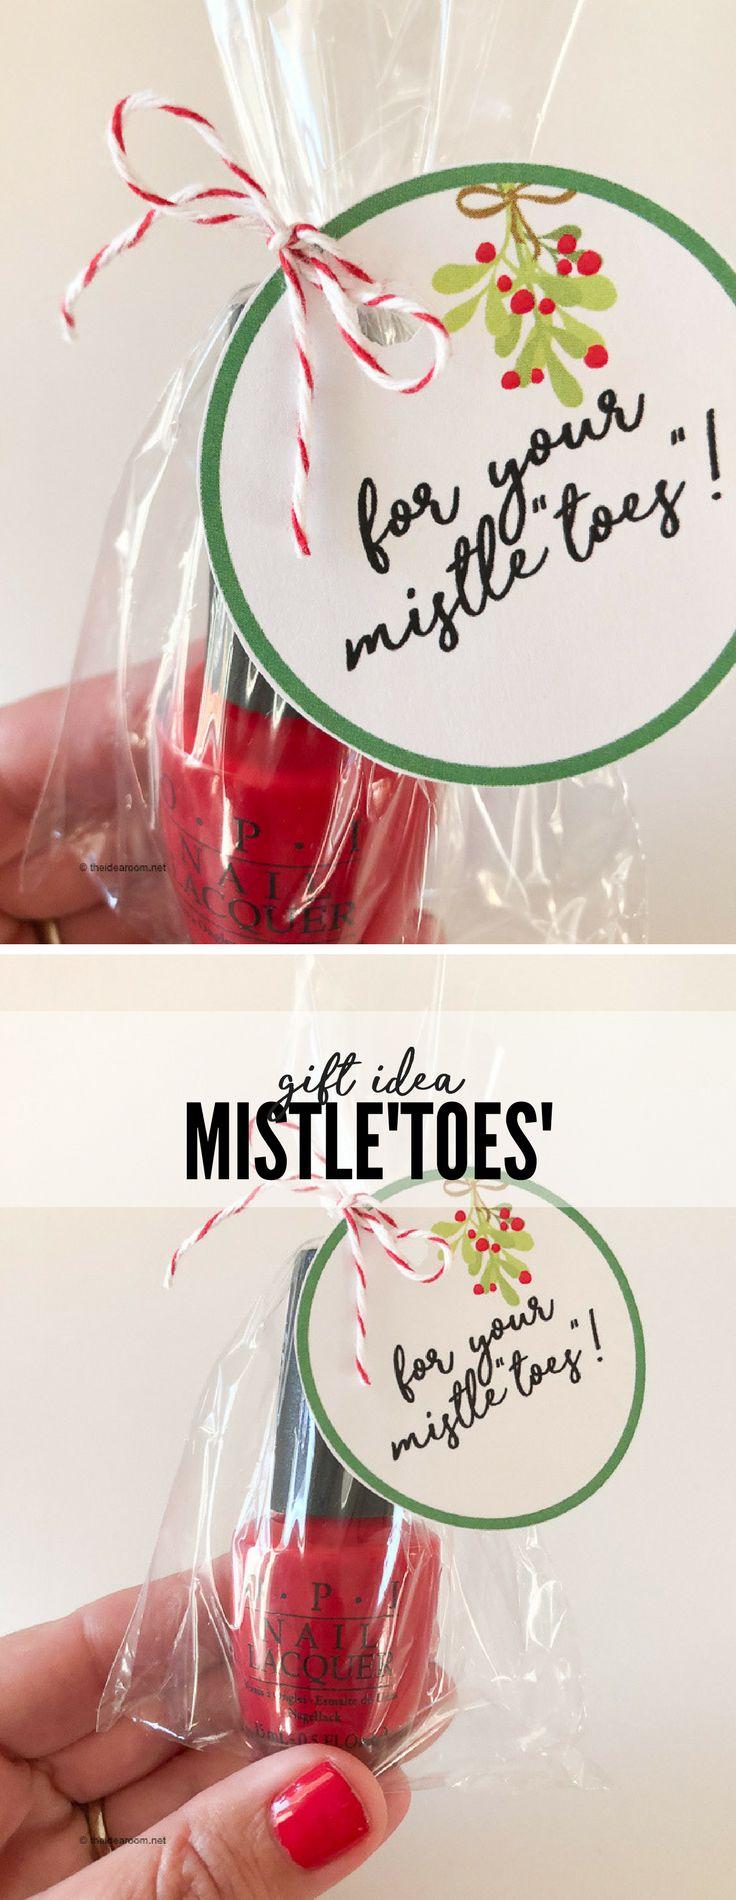 Christmas Gift   Christmas Printable   Free Printable   Whip up this simple Mistletoes Nail Polish Gift for your friends and family.